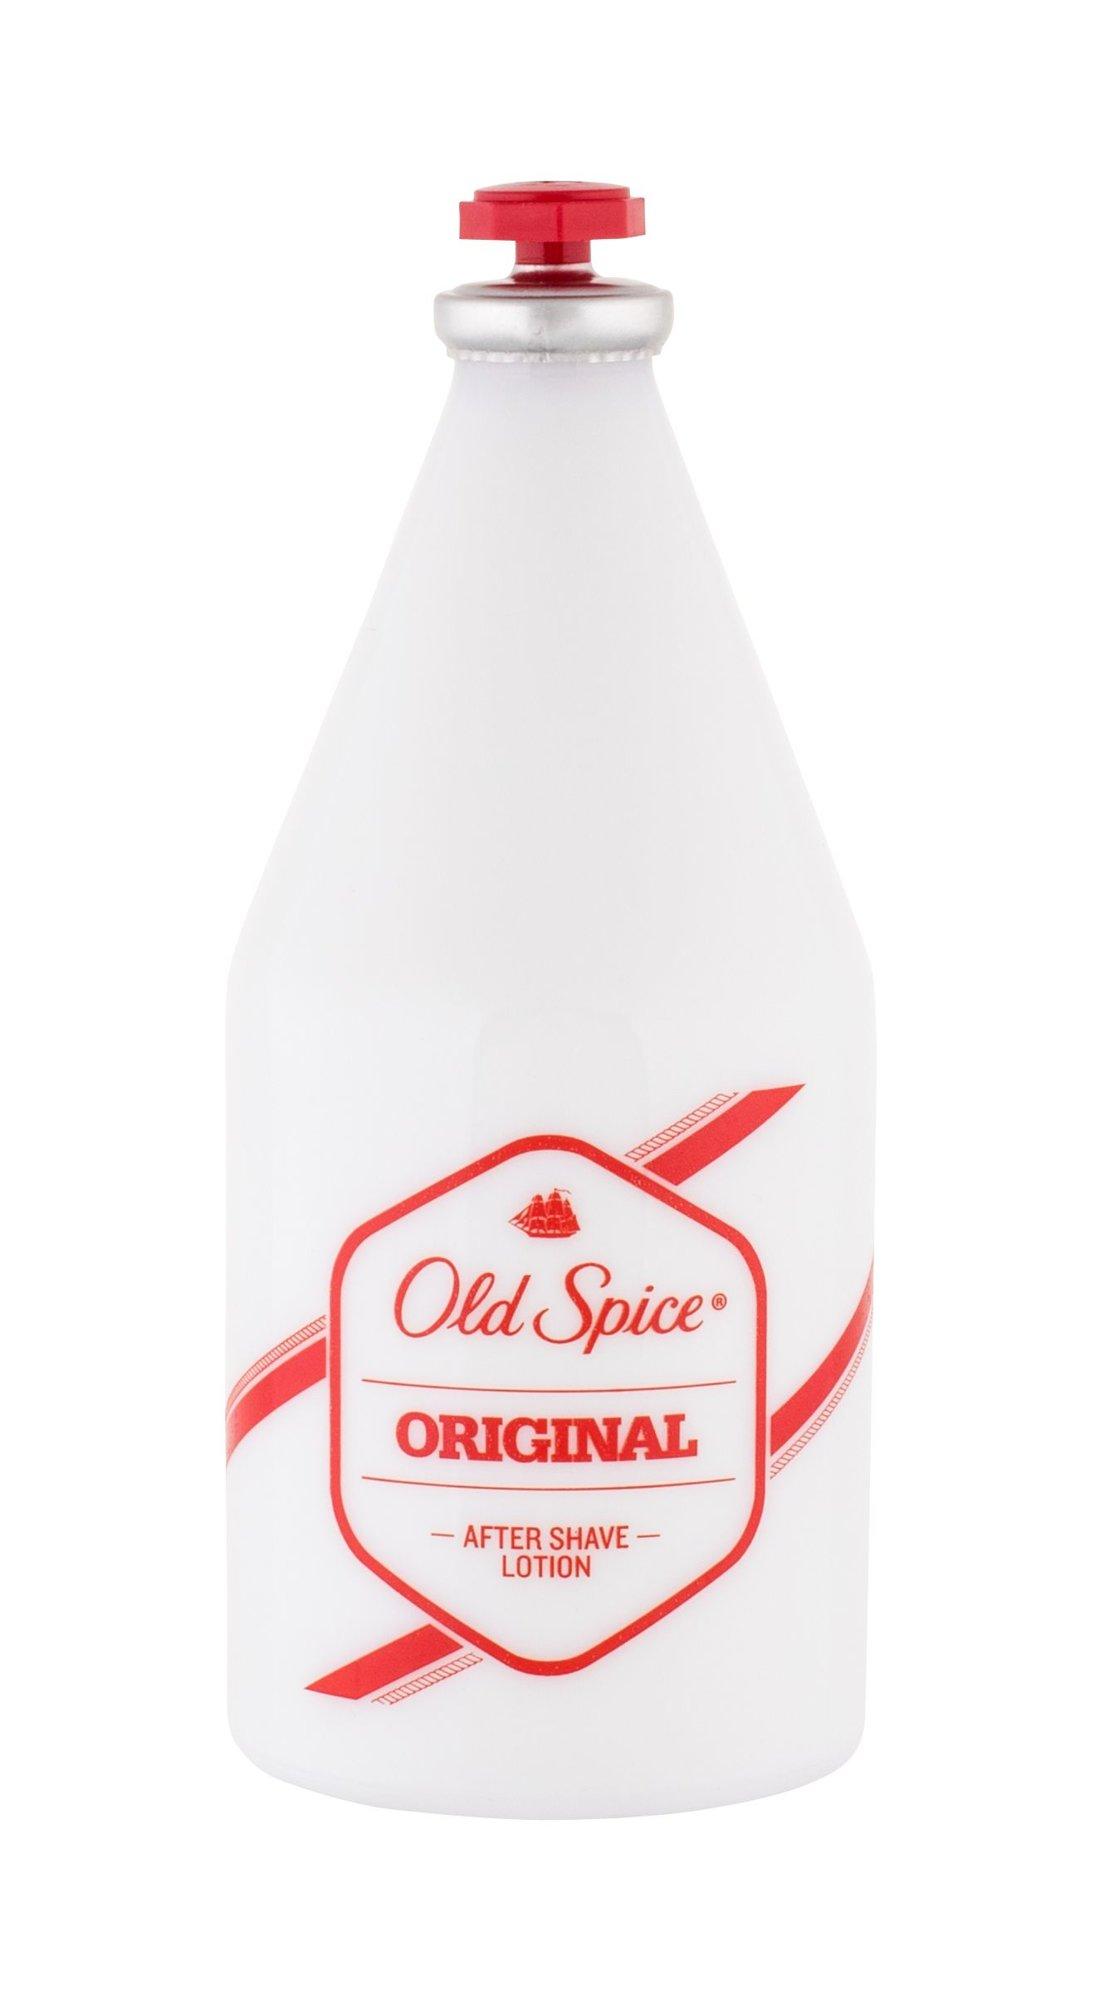 Old Spice Original Aftershave 150ml